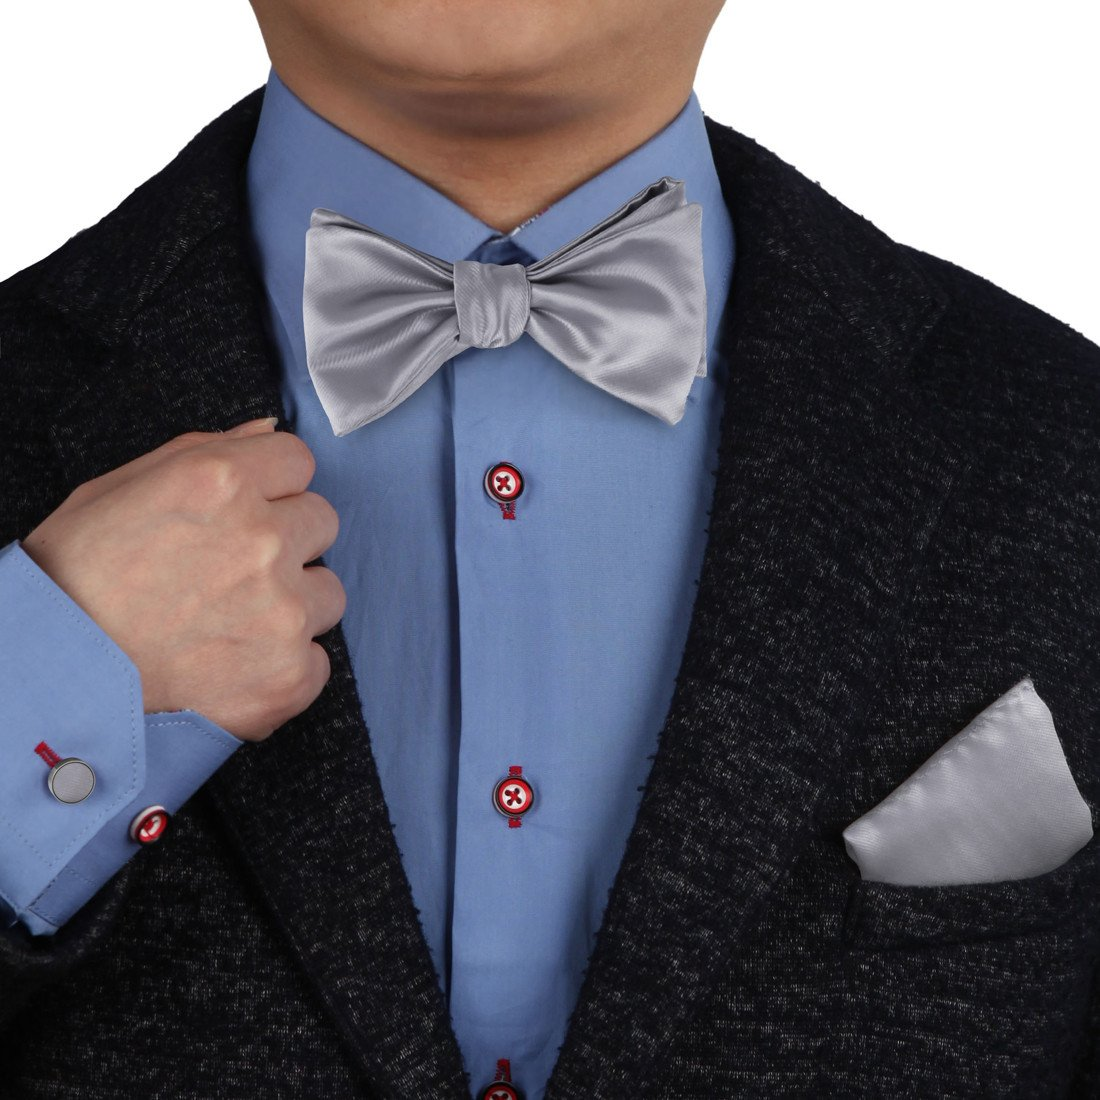 Slate Gray Self-tie Silk Bow Tie For Mens Handkerchiefs Cufflinks Set With Gift Box BT1004  Slate Gray